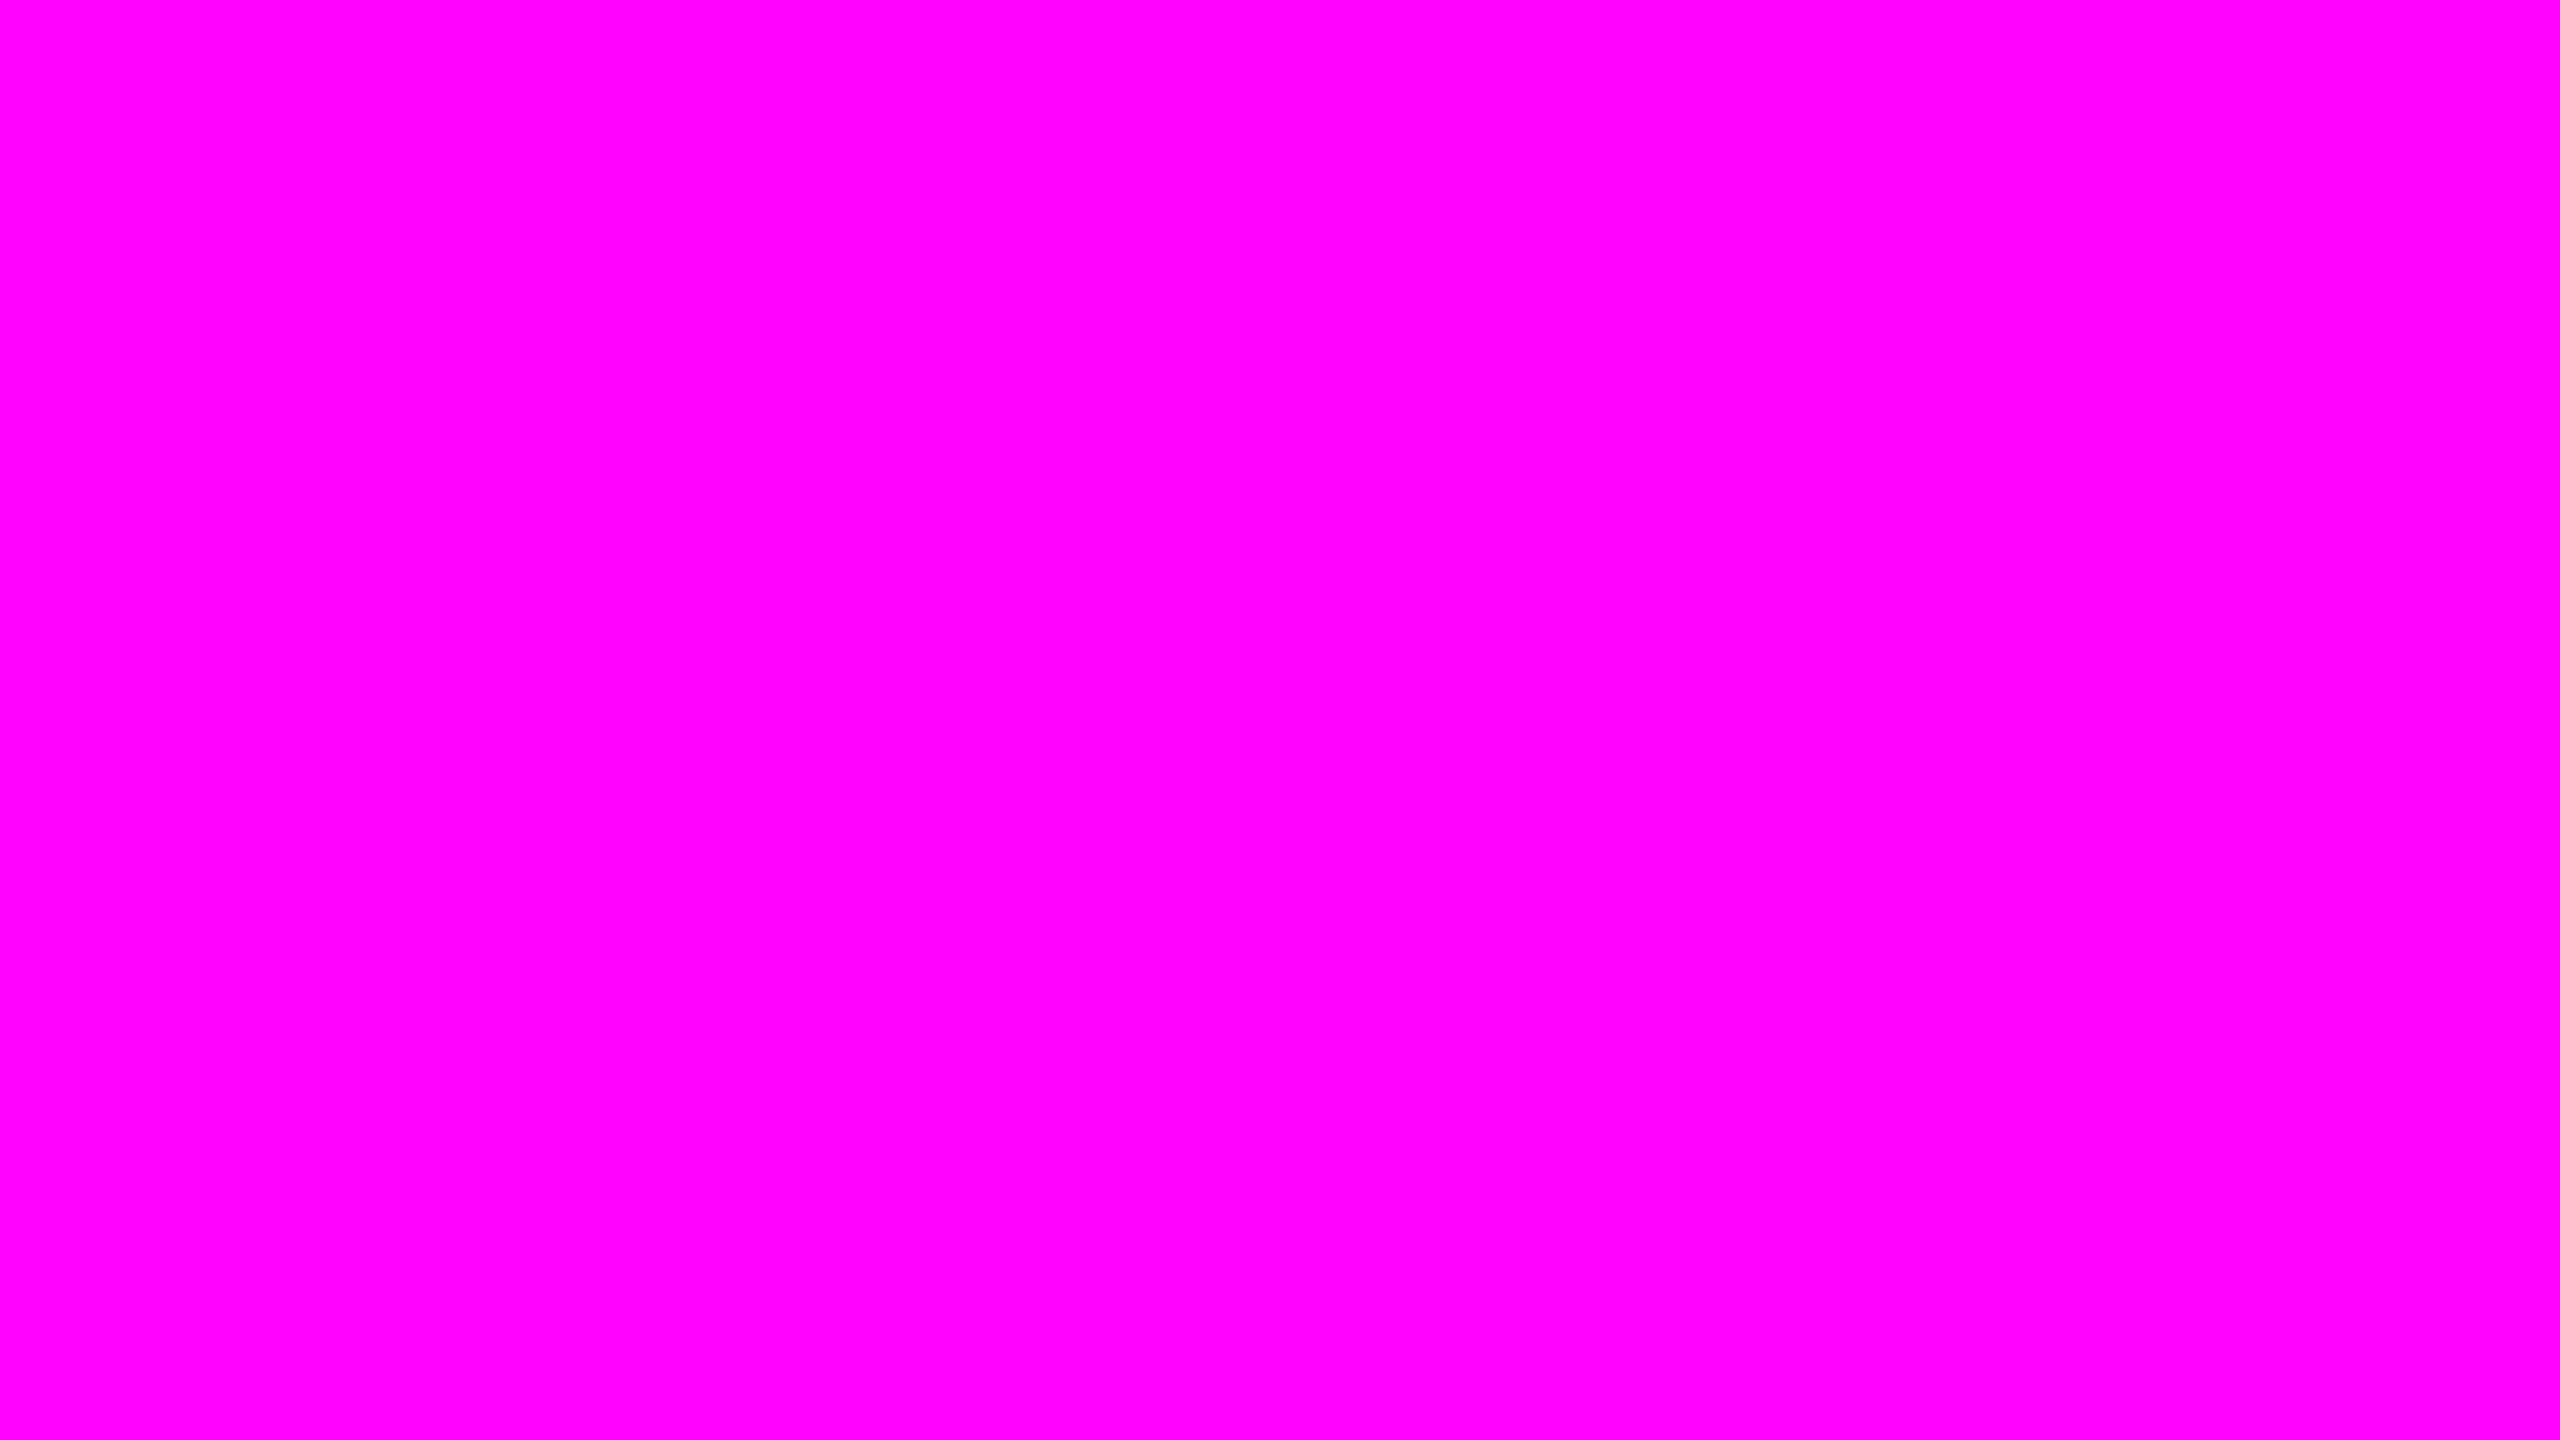 2560x1440 Fuchsia Solid Color Background